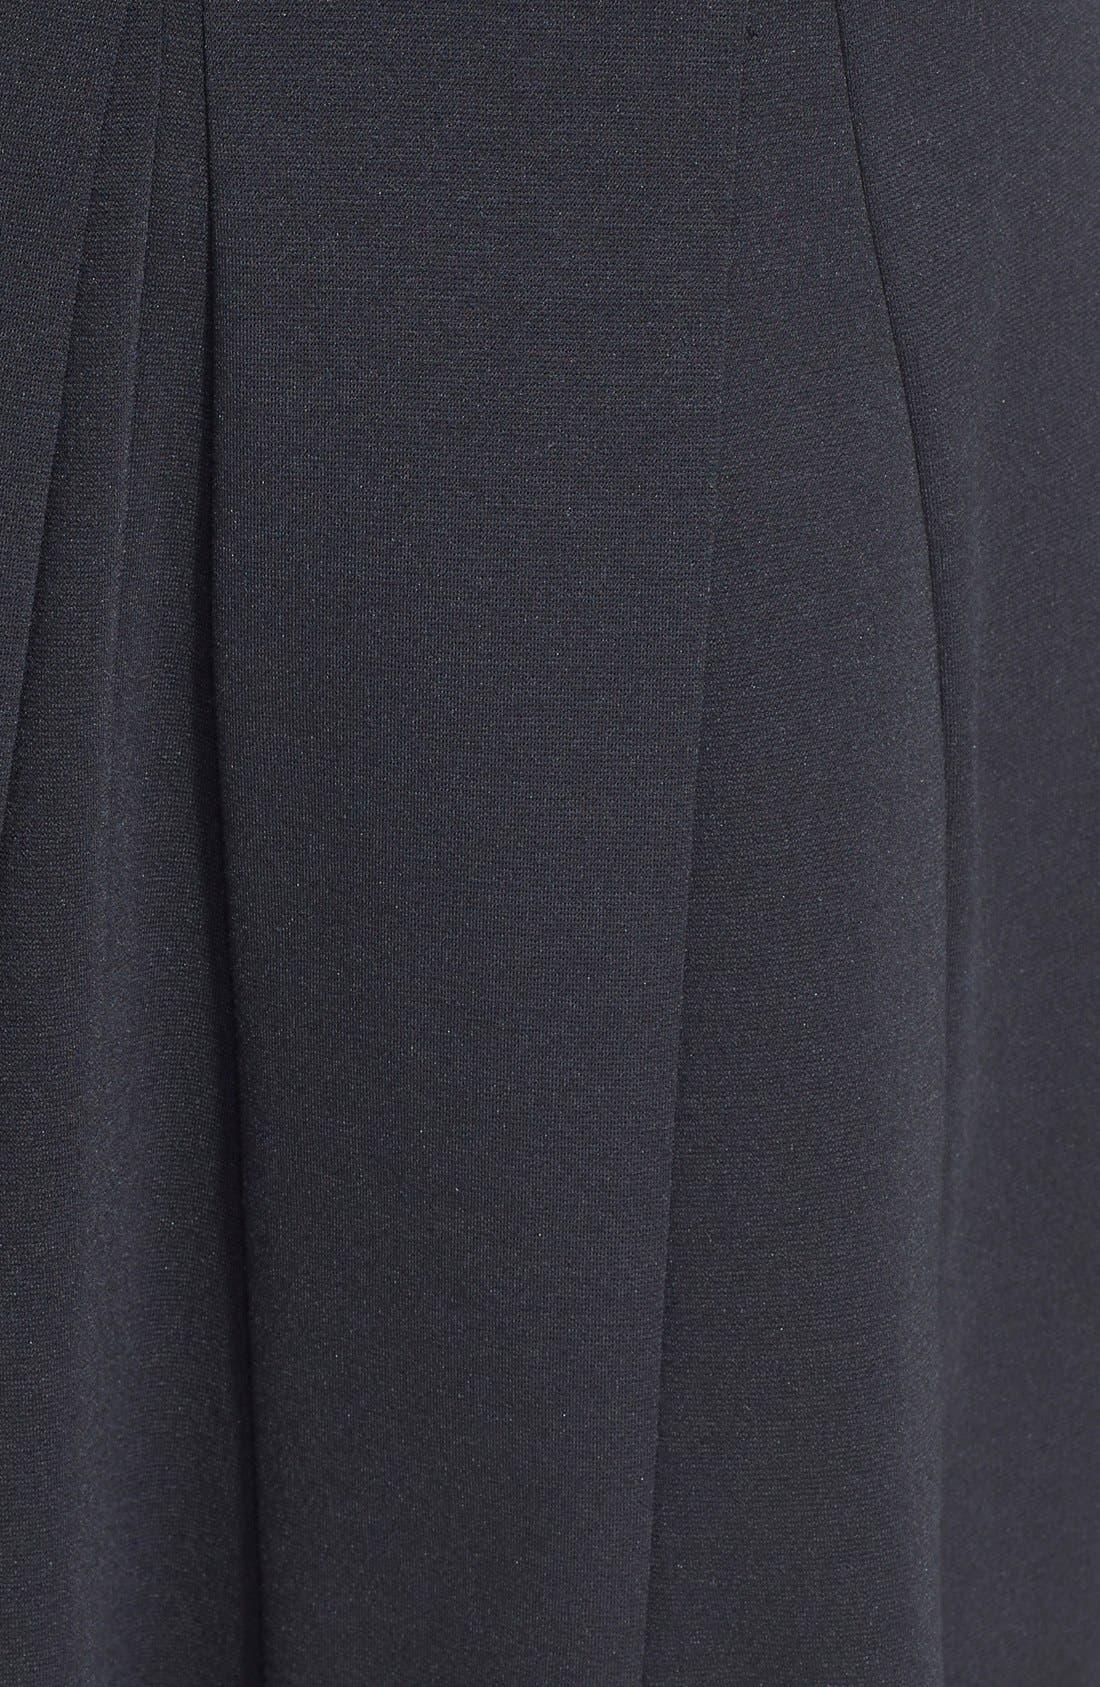 Alternate Image 3  - MICHAEL Michael Kors Belted Fit & Flare Dress